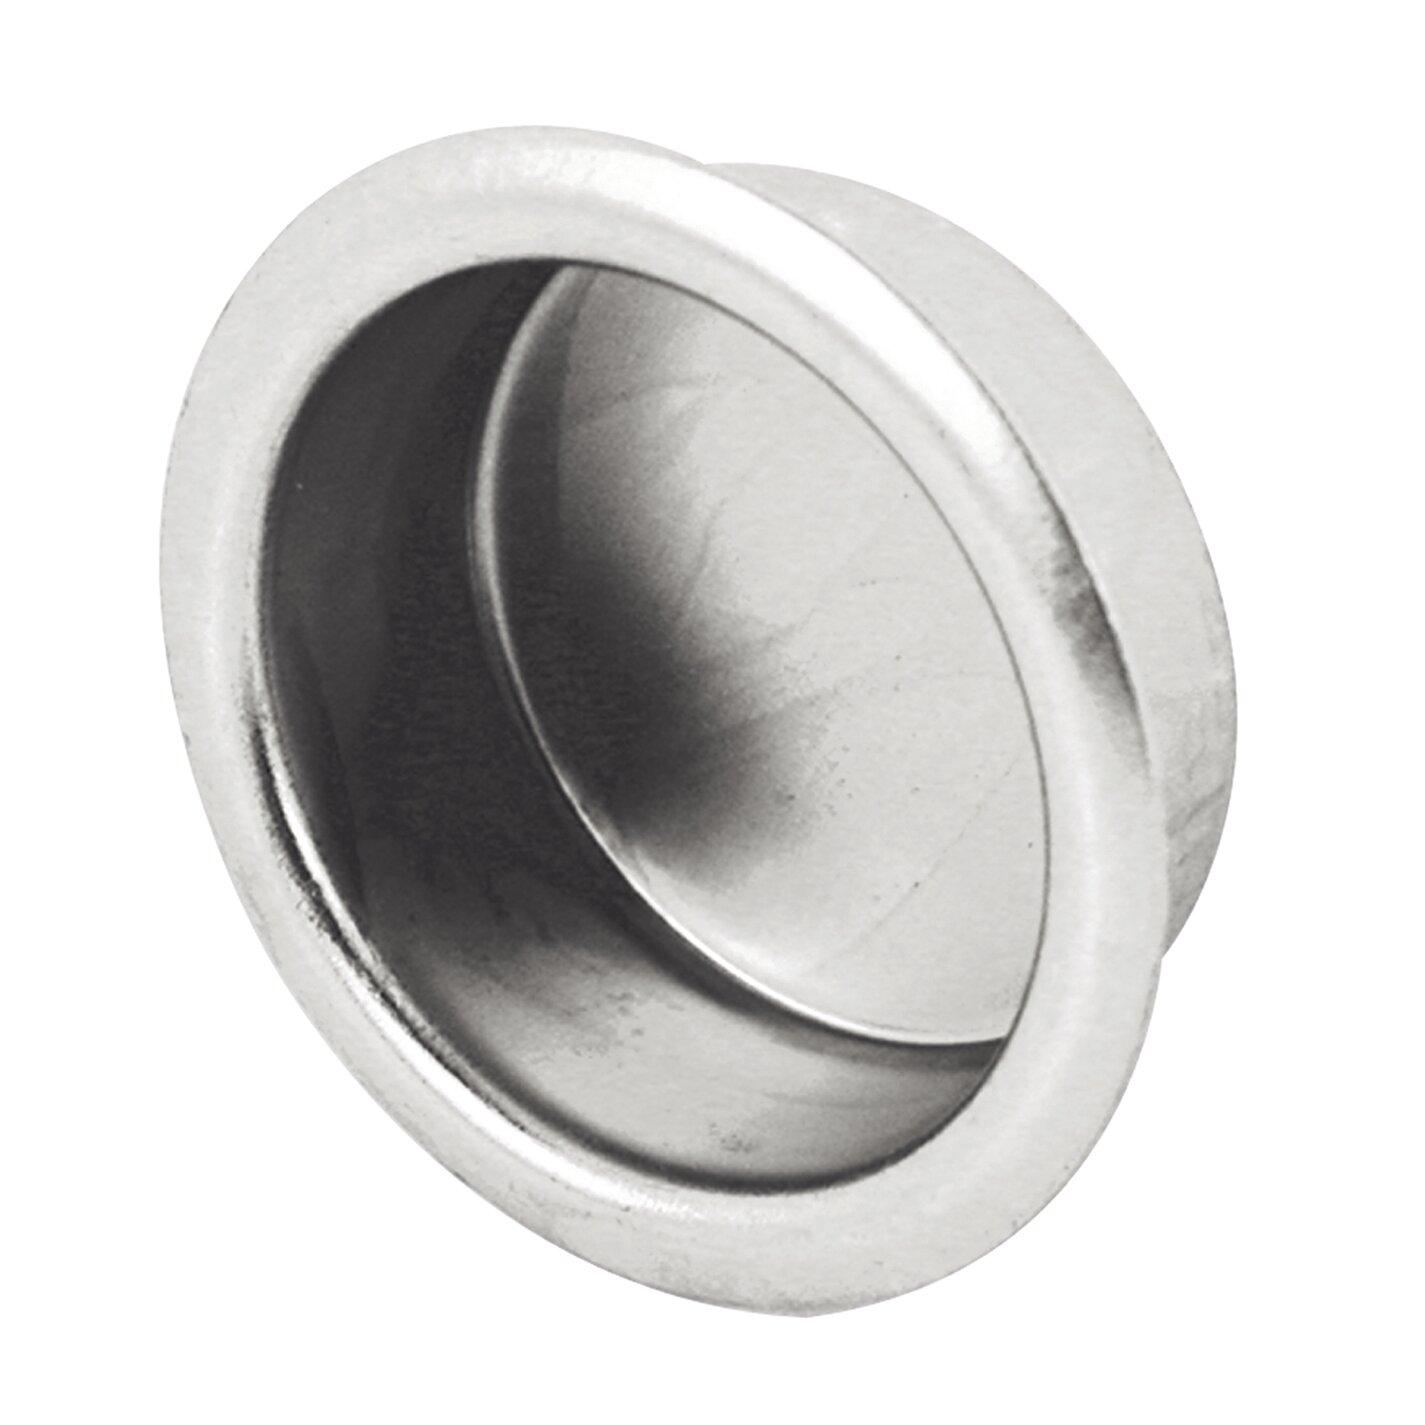 com doors bronze pull national rubbed pl in hardware at finger sliding pulls closet shop door lowes oil